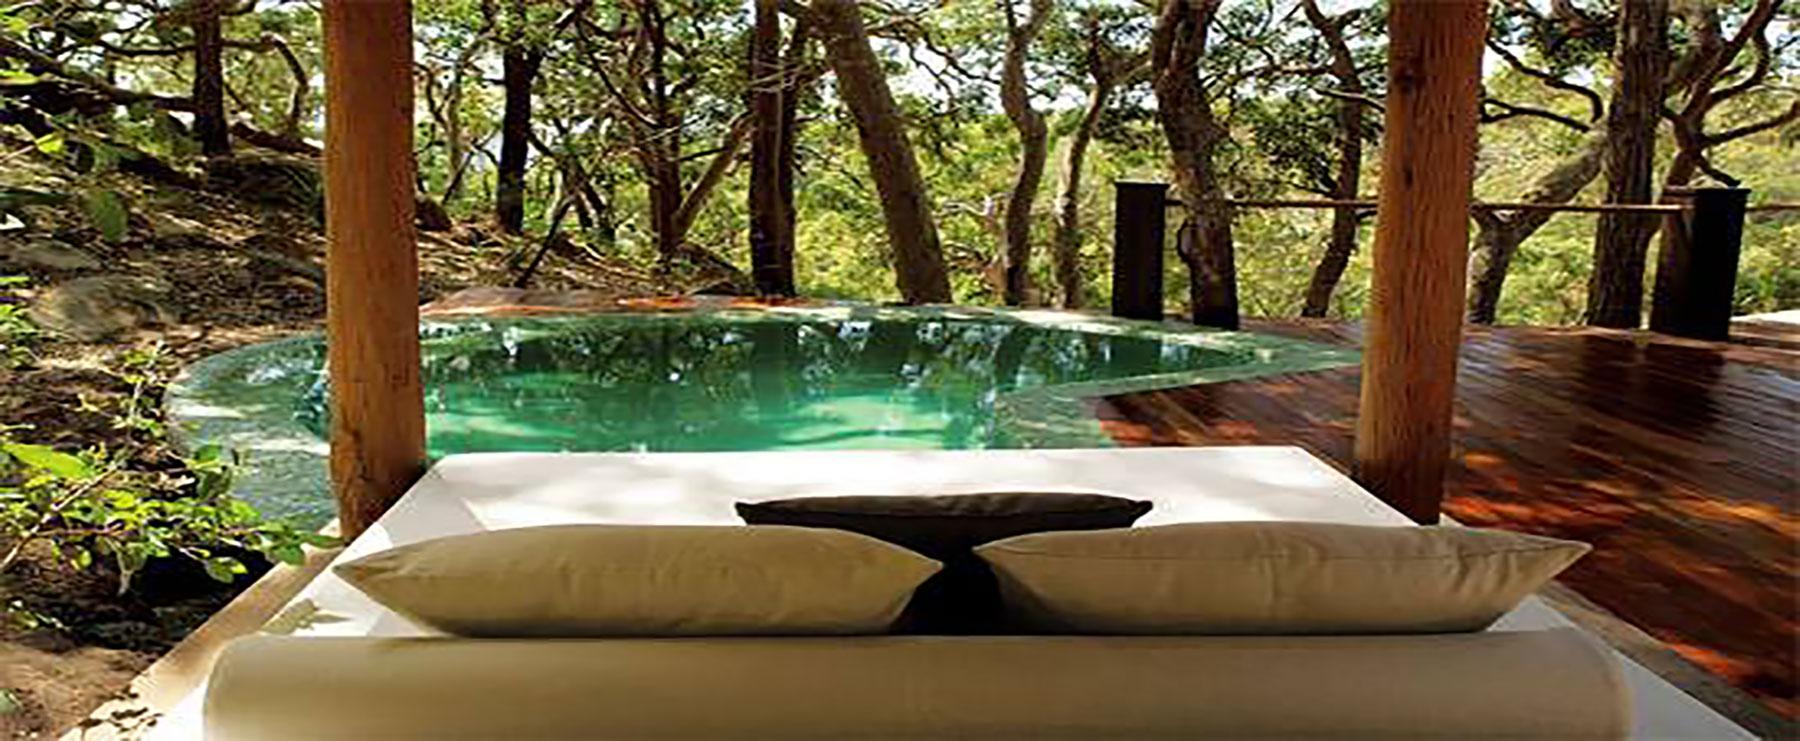 guide d 39 hotels singuliers d 39 exception hotels avec spa. Black Bedroom Furniture Sets. Home Design Ideas